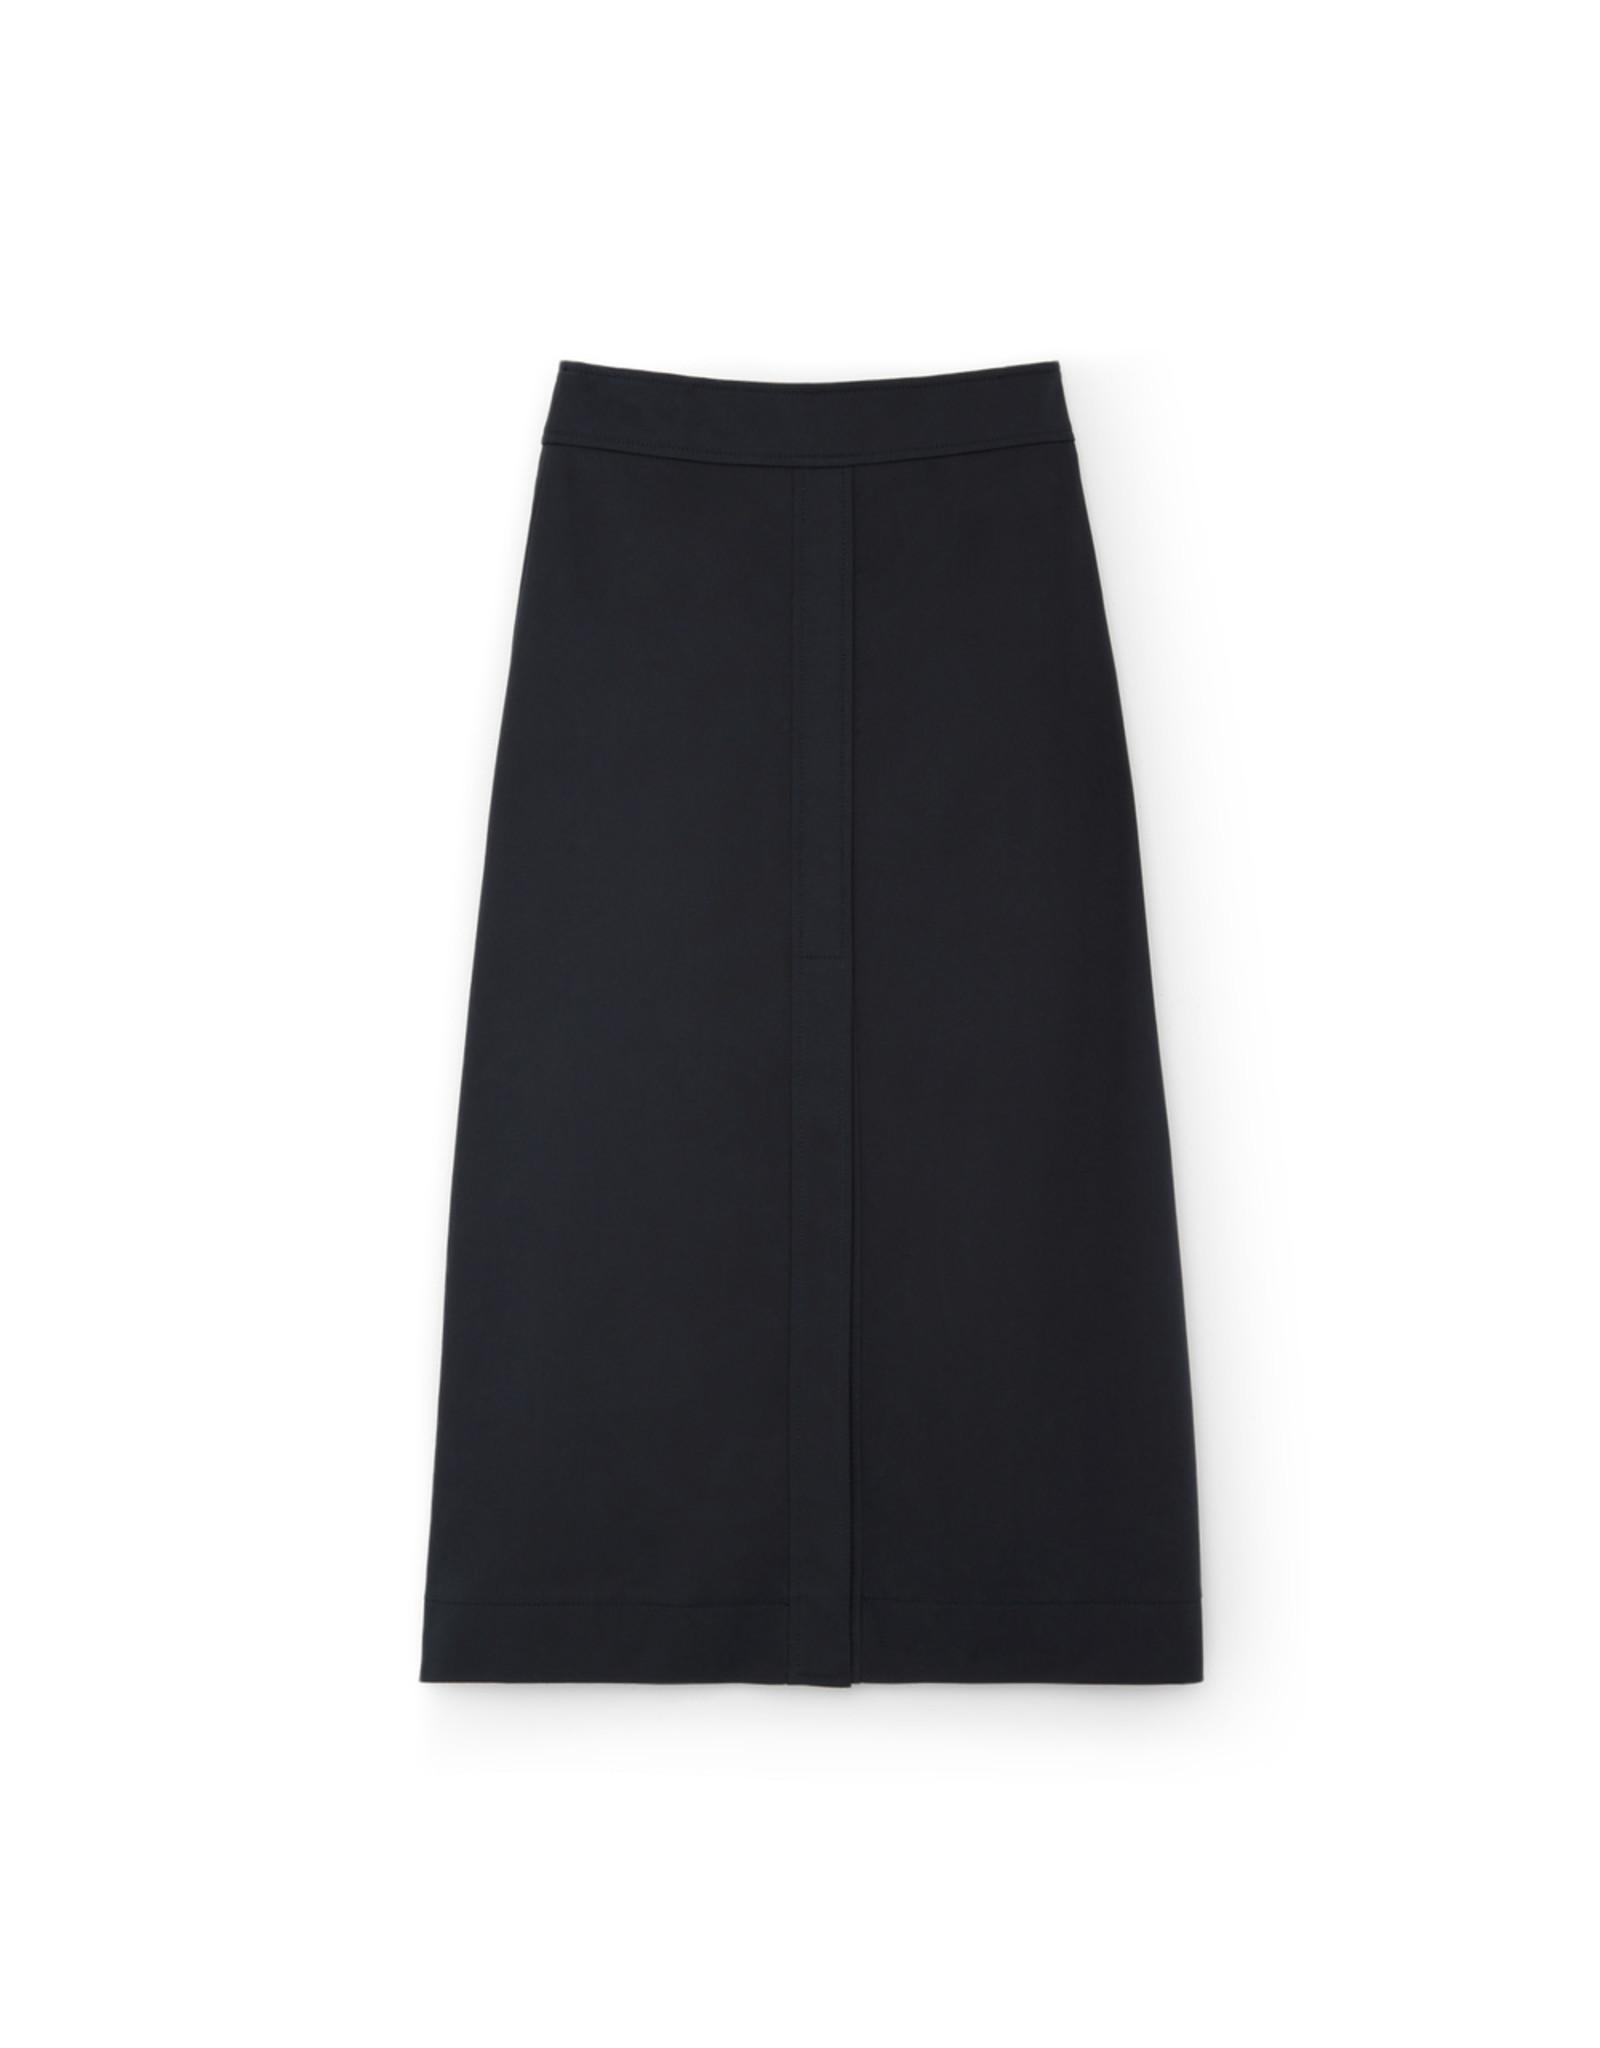 G. Label G. Label Stewart A-Line Cotton Skirt (Color: Navy, Size: 8)